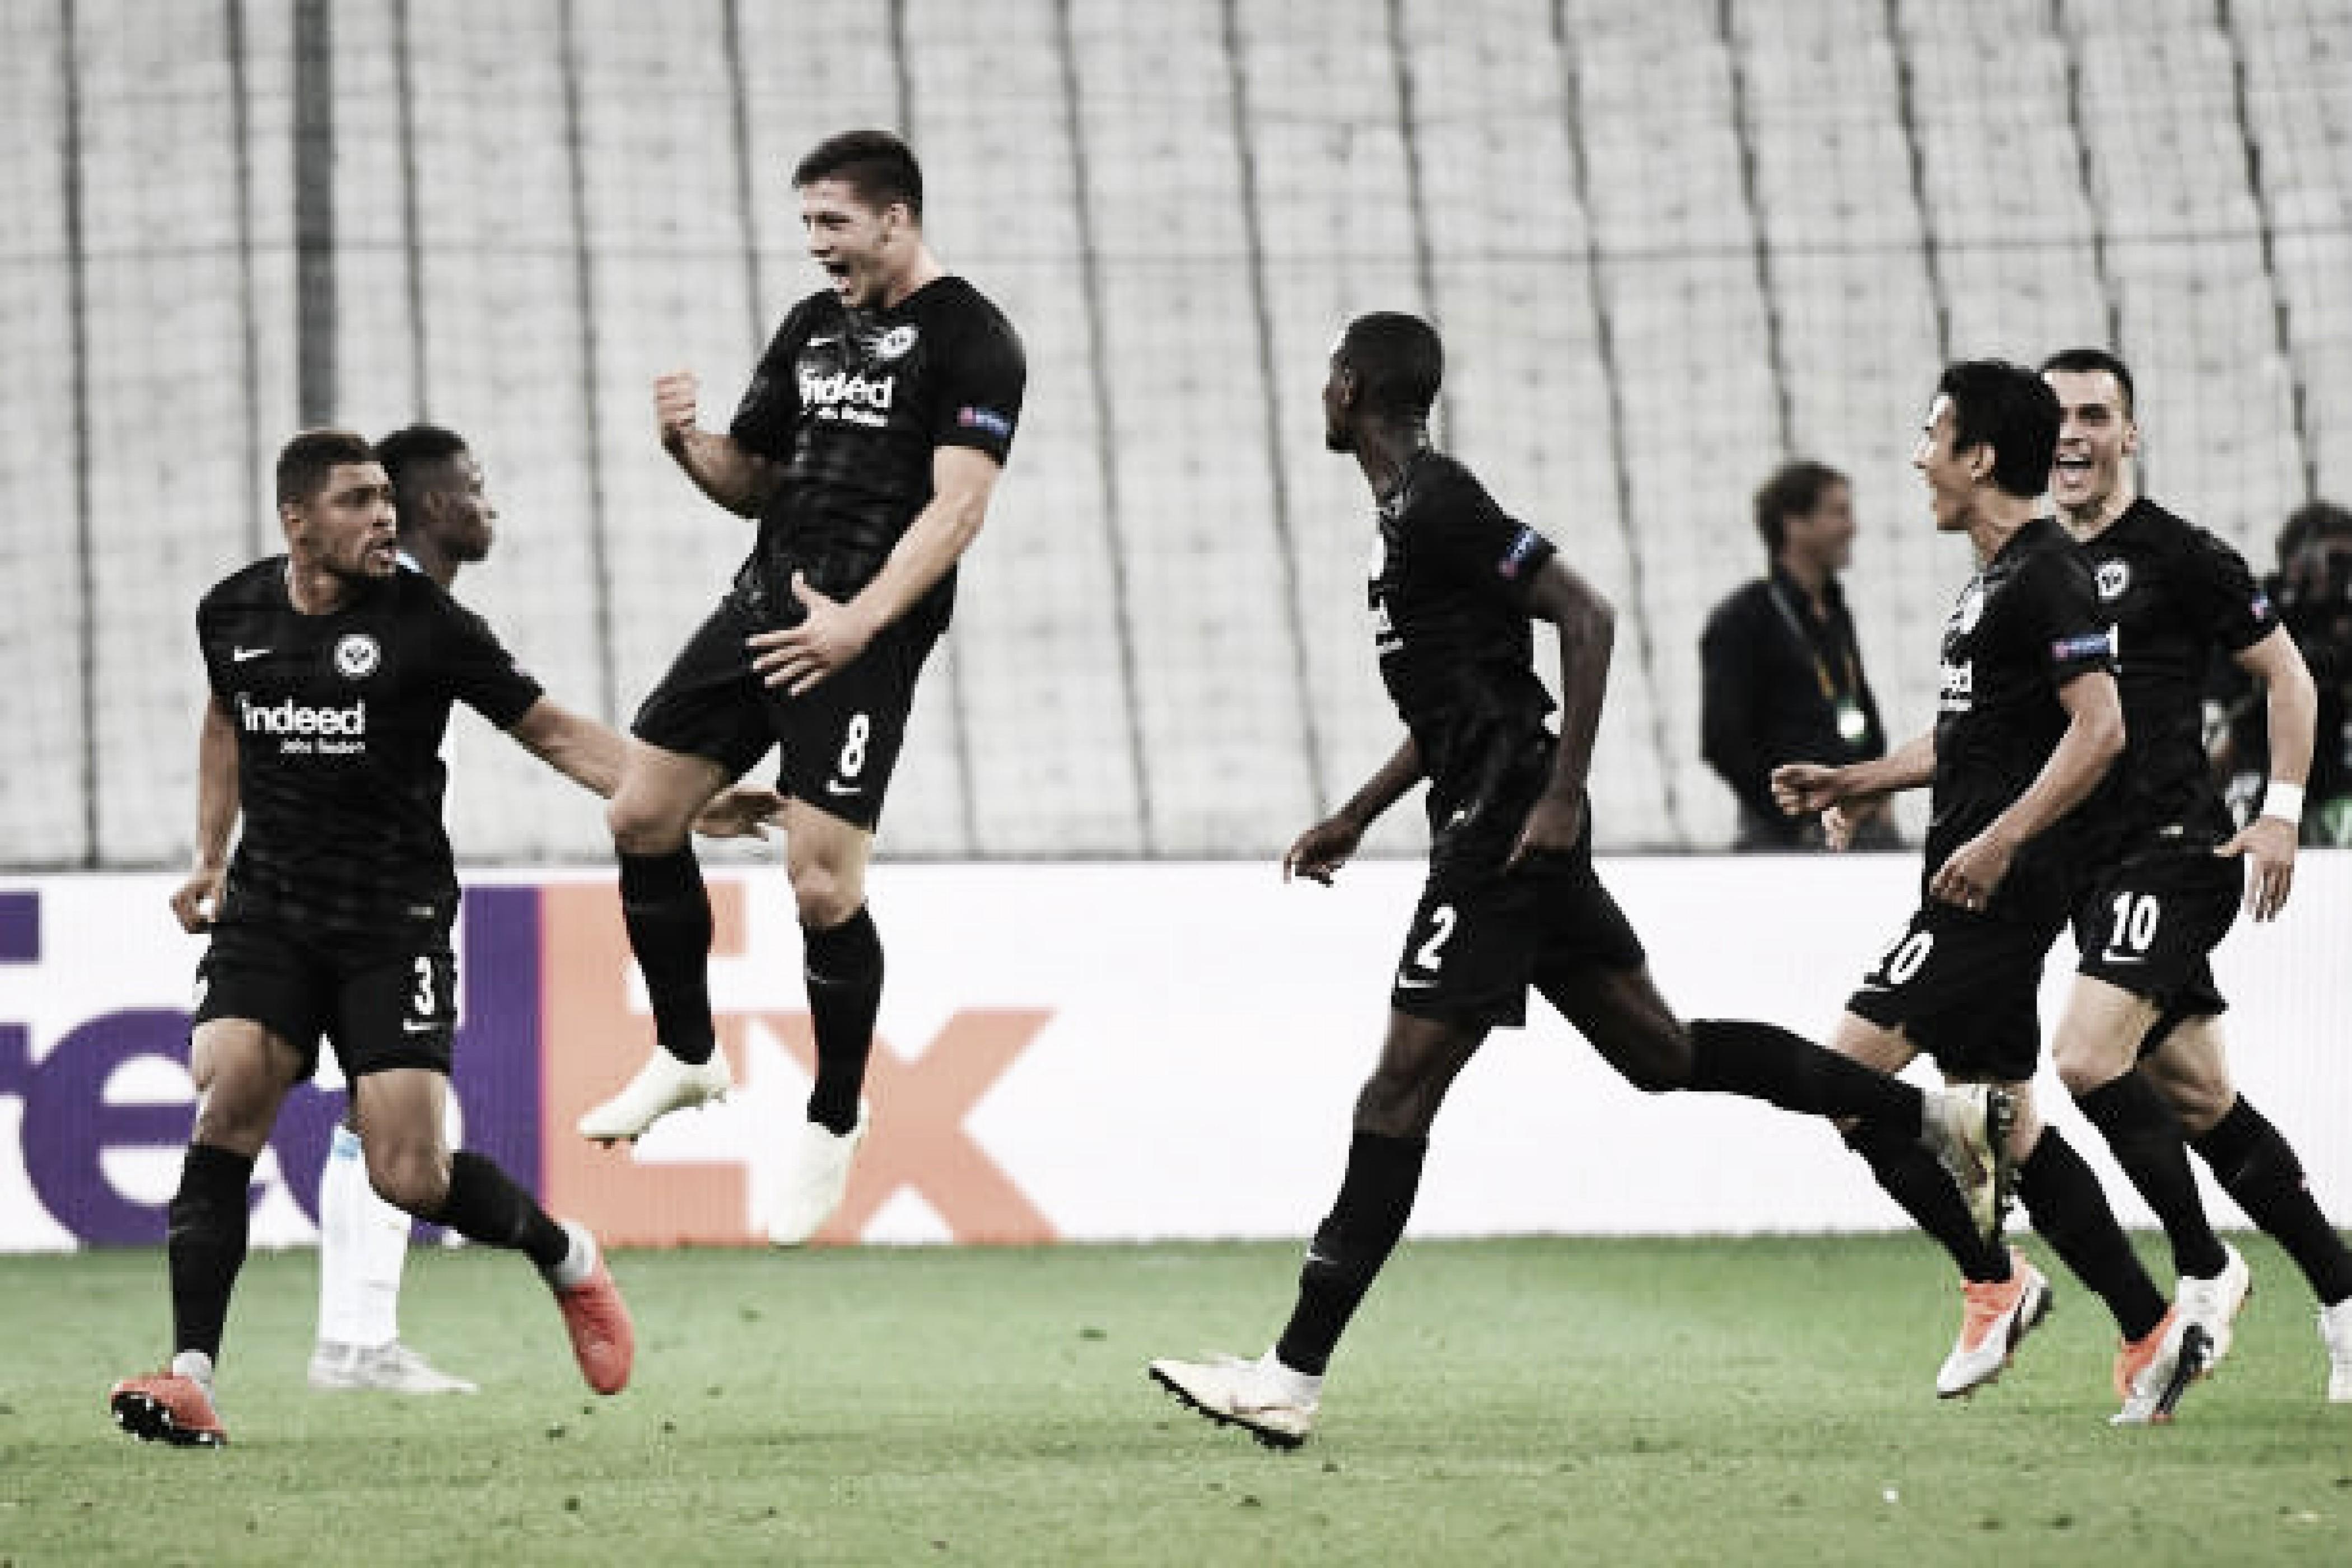 Eitrancht Frankfurt marca no fim e vence Olympique Marseille na Europa League